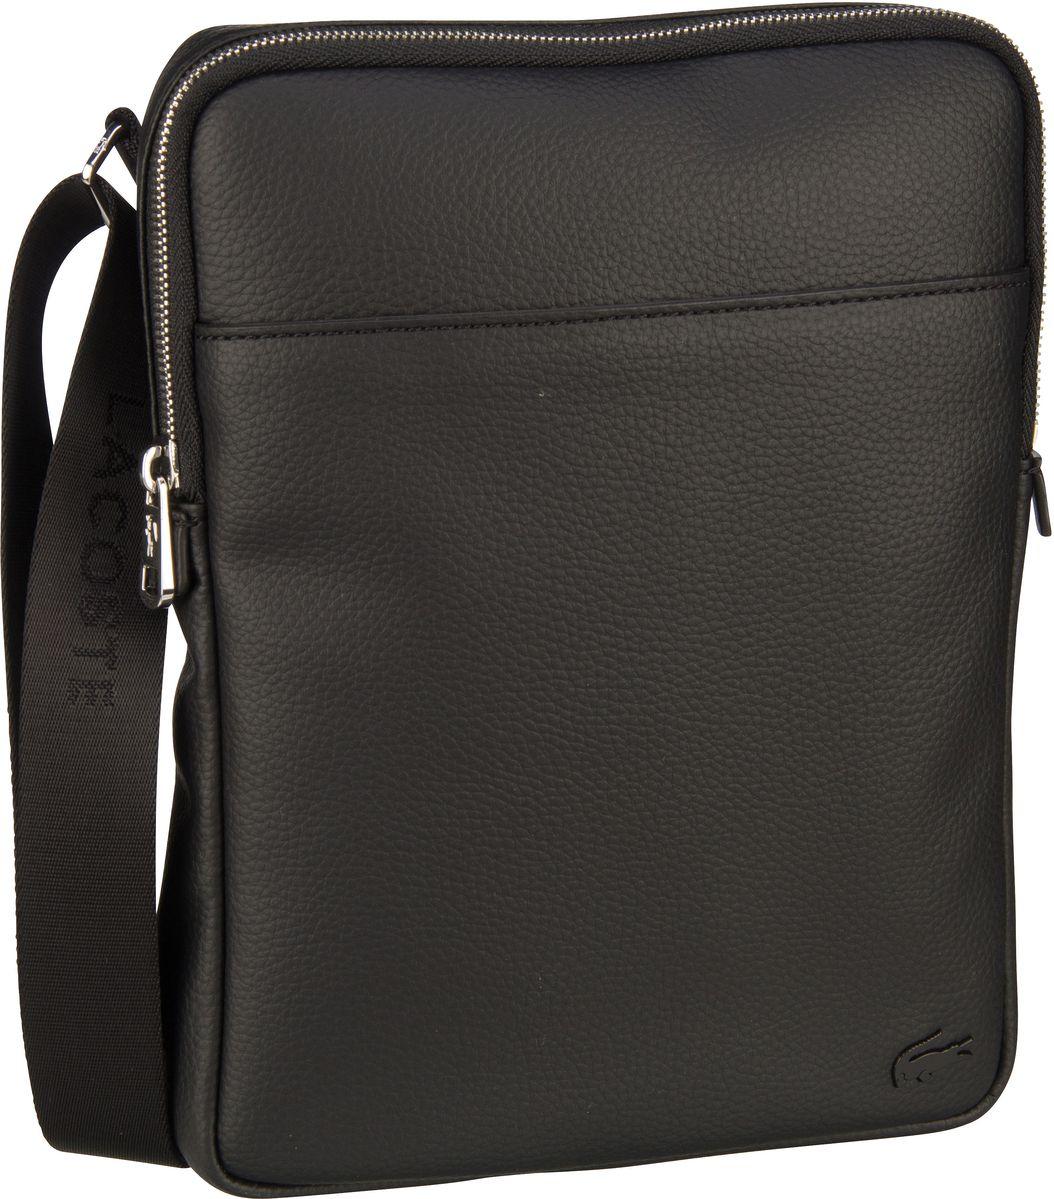 Umhängetasche Flat Crossover Bag M 2840 Black